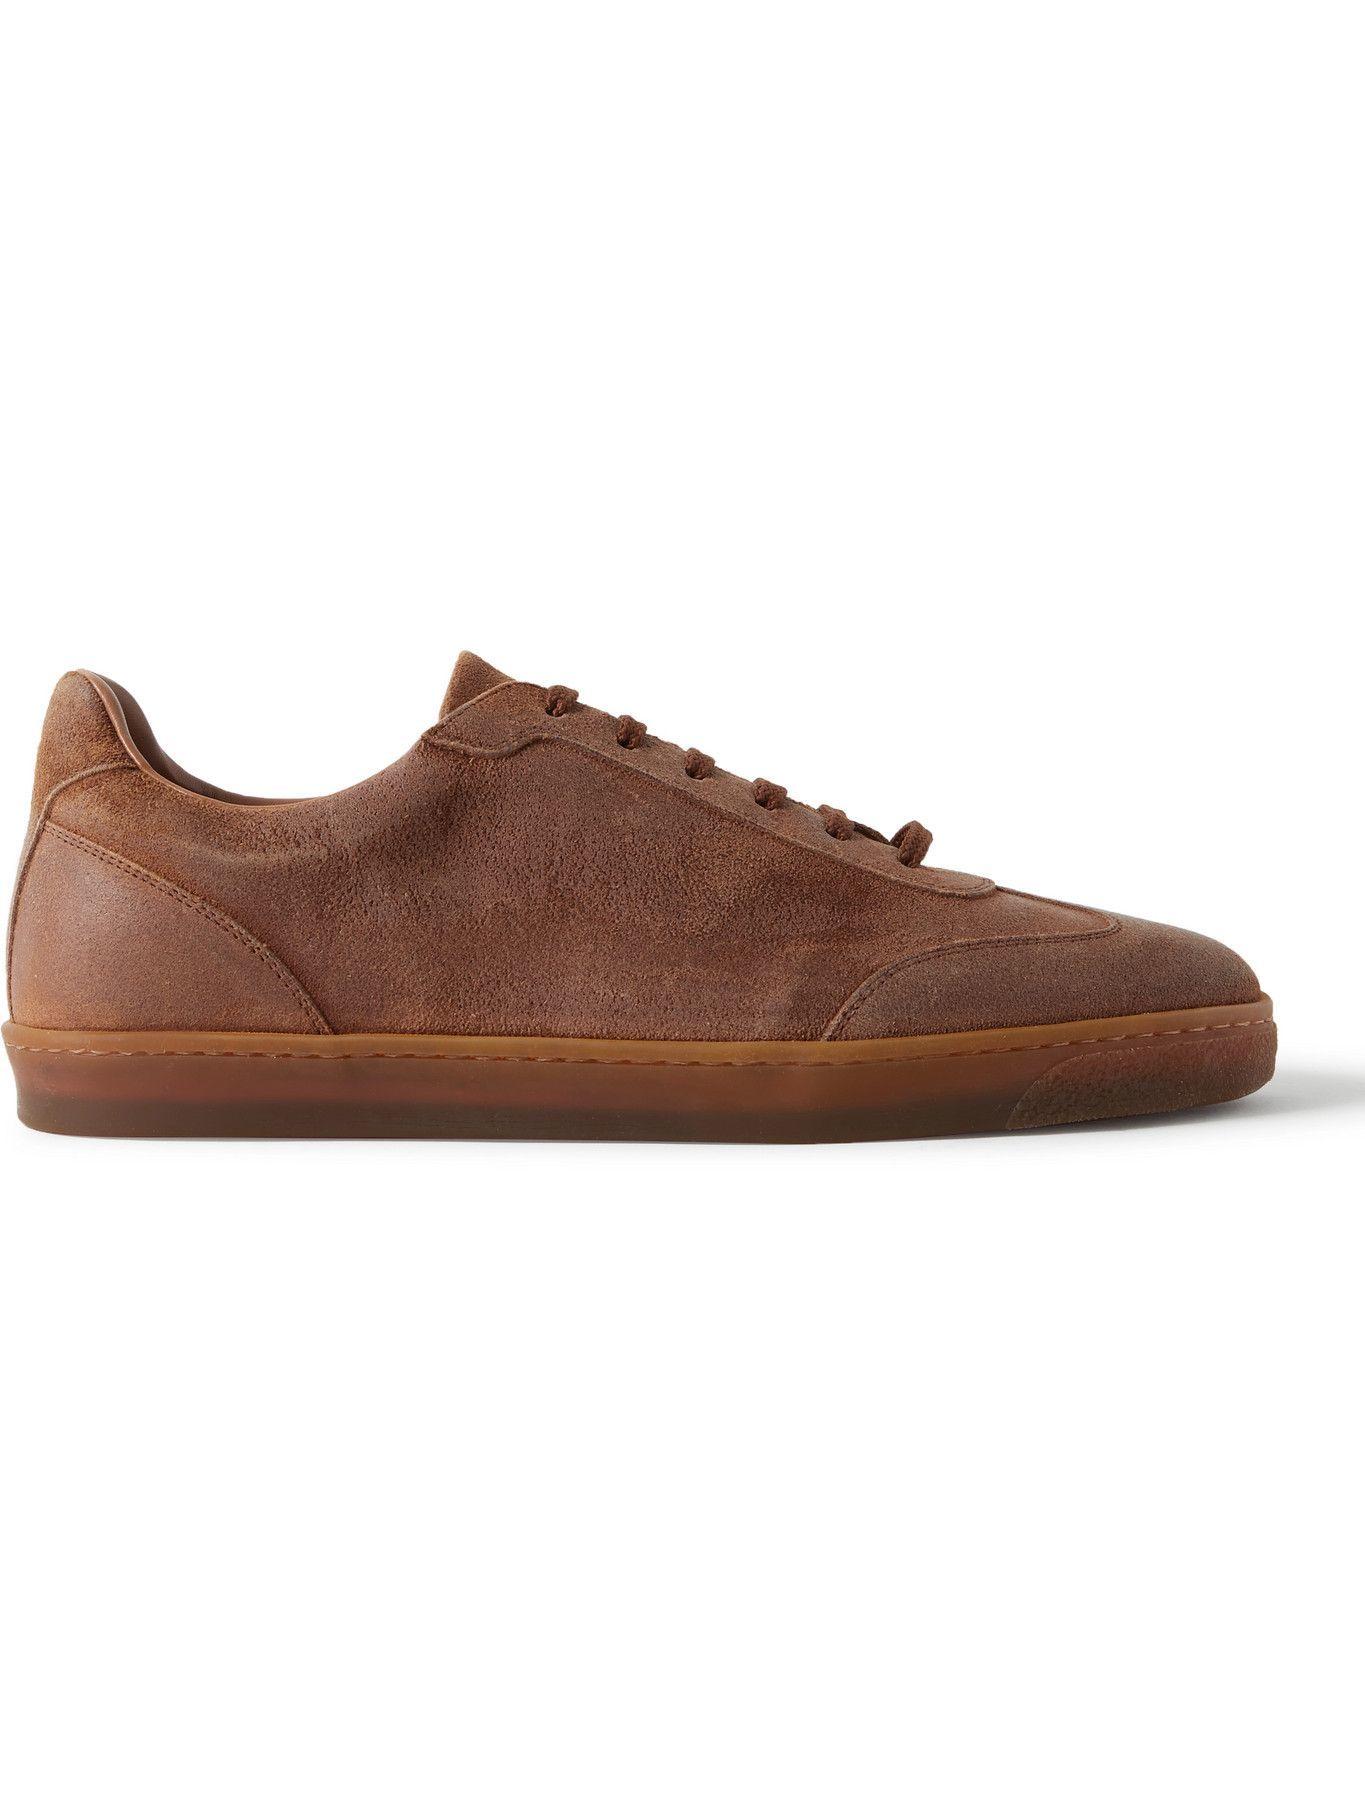 Photo: Brunello Cucinelli - Suede Sneakers - Brown